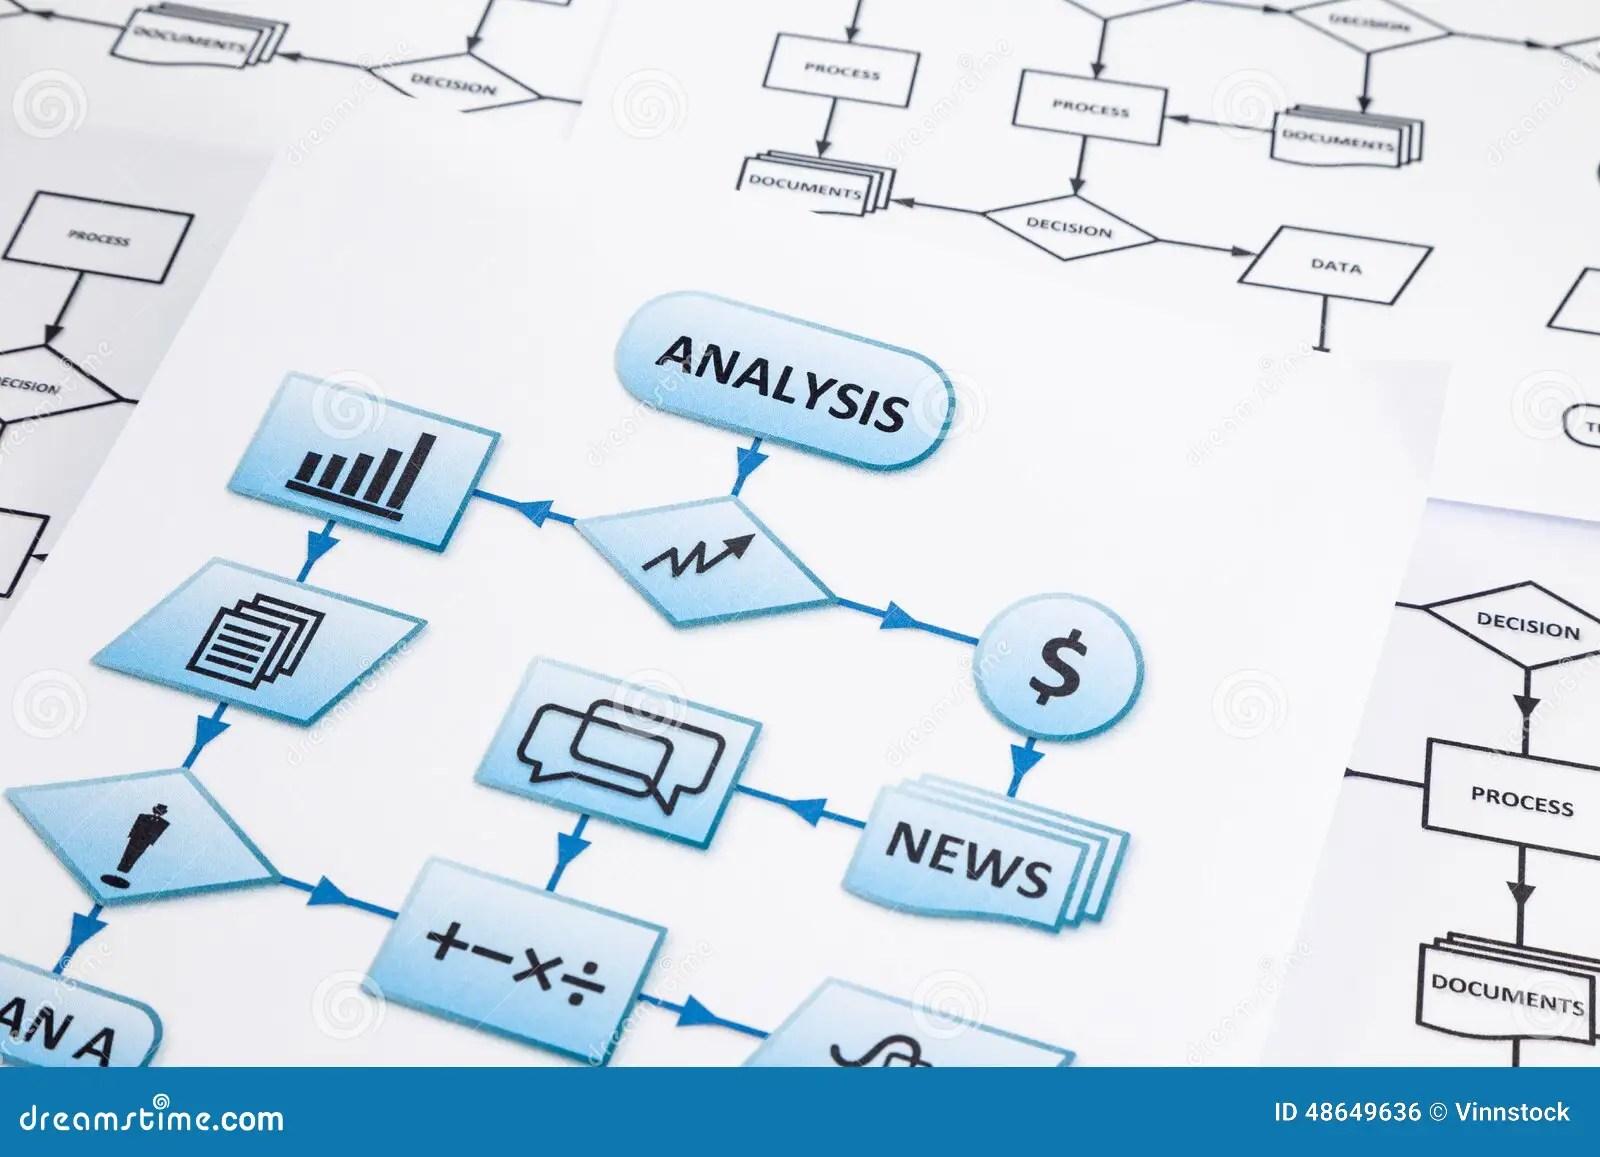 business process flow diagram symbols wiring explained analysis worksheets stock photo image